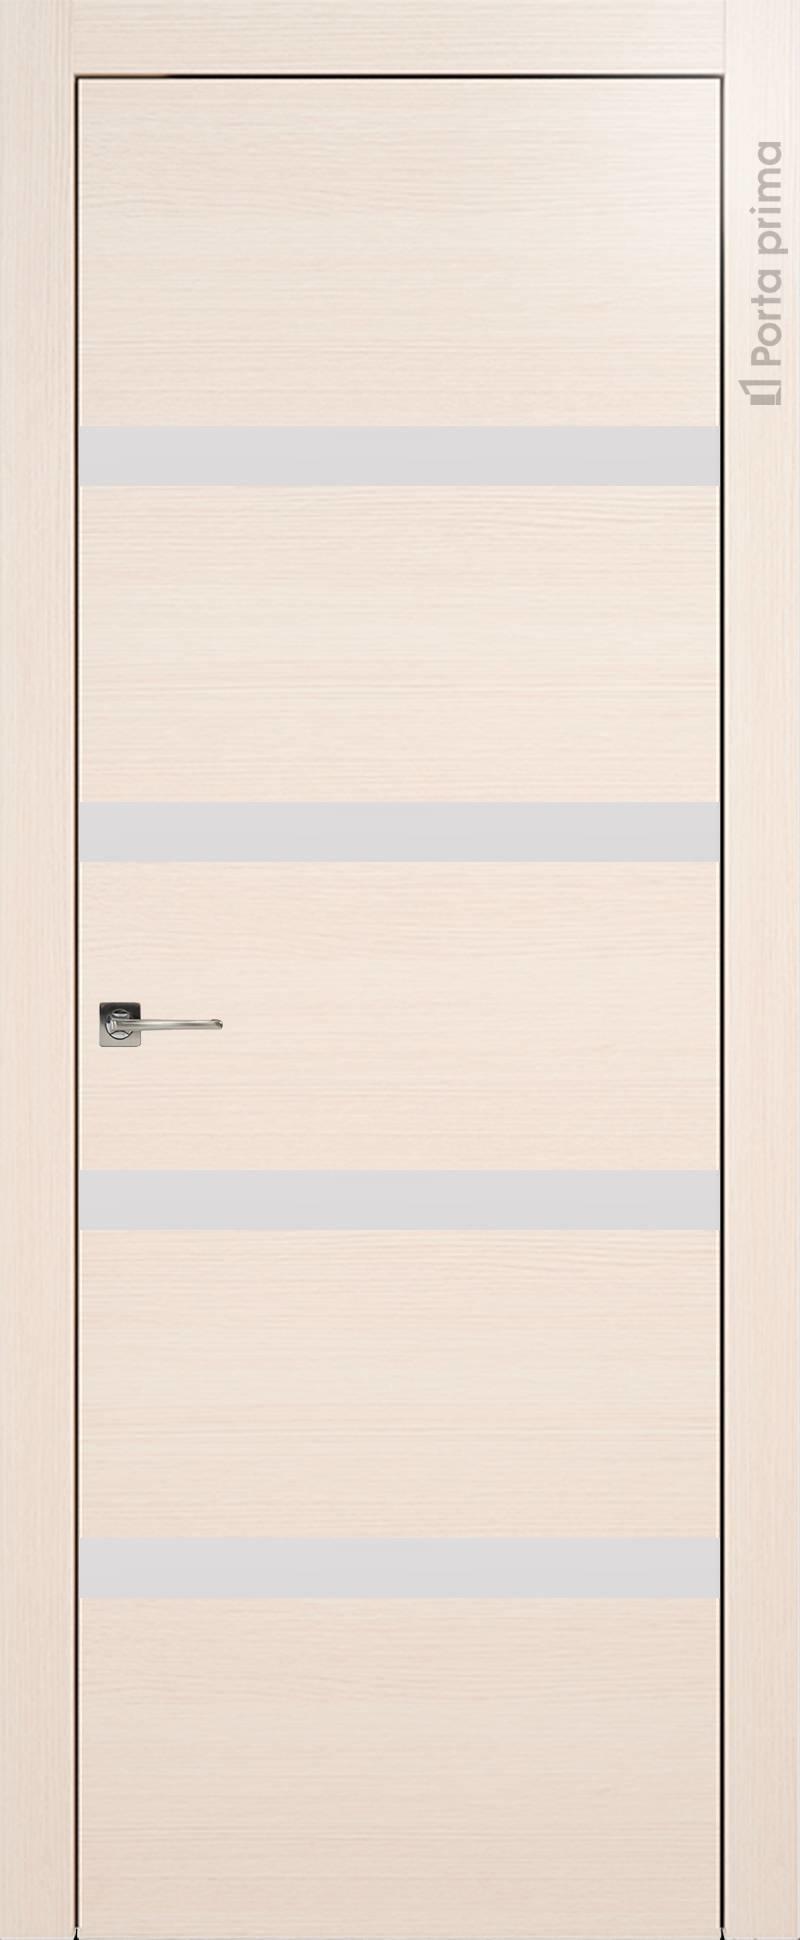 Tivoli Д-4 цвет - Беленый дуб Без стекла (ДГ)